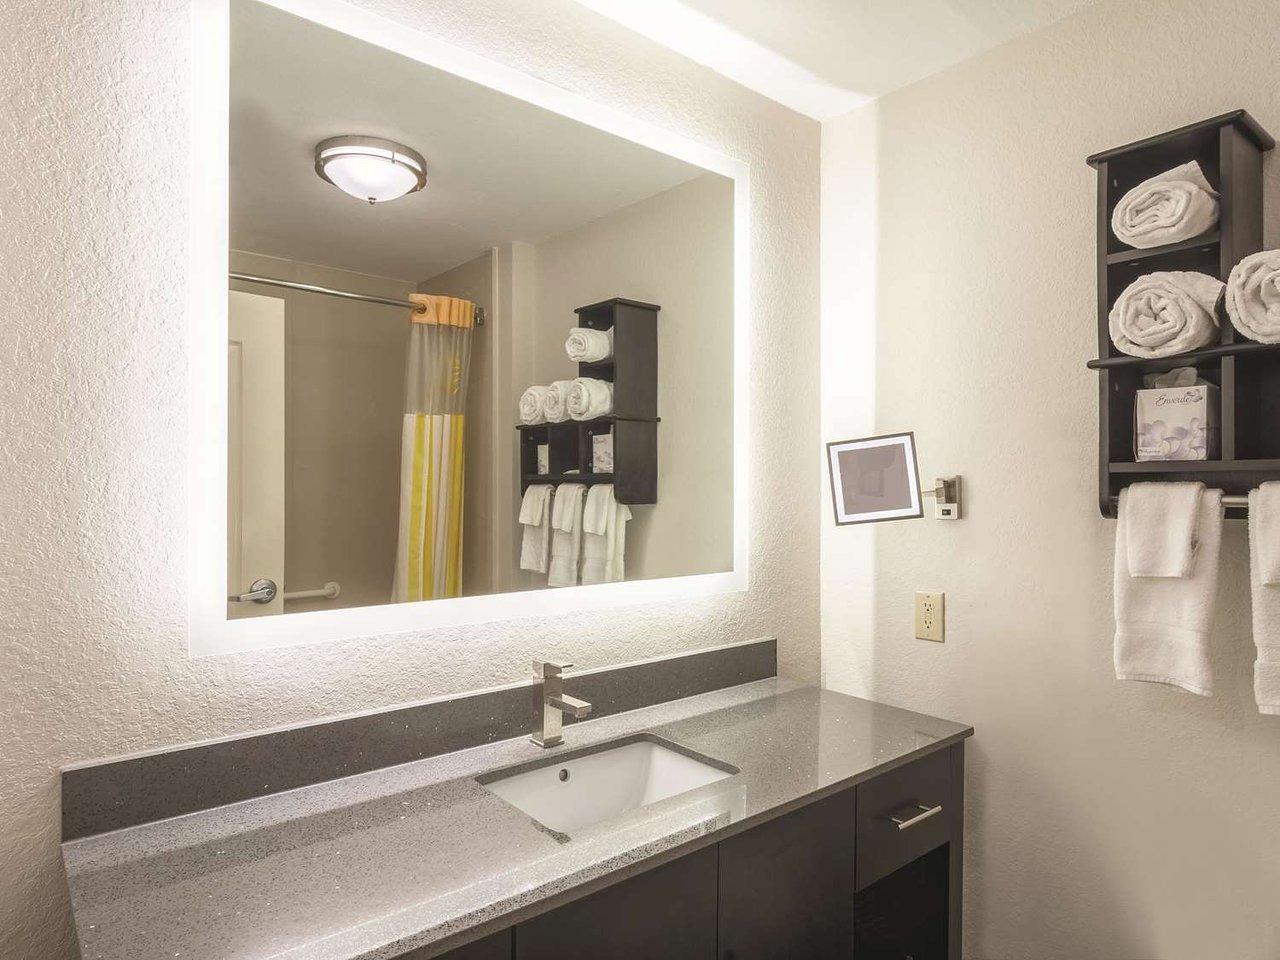 la quinta inn suites by wyndham prattville 129 1 6 9 rh tripadvisor com